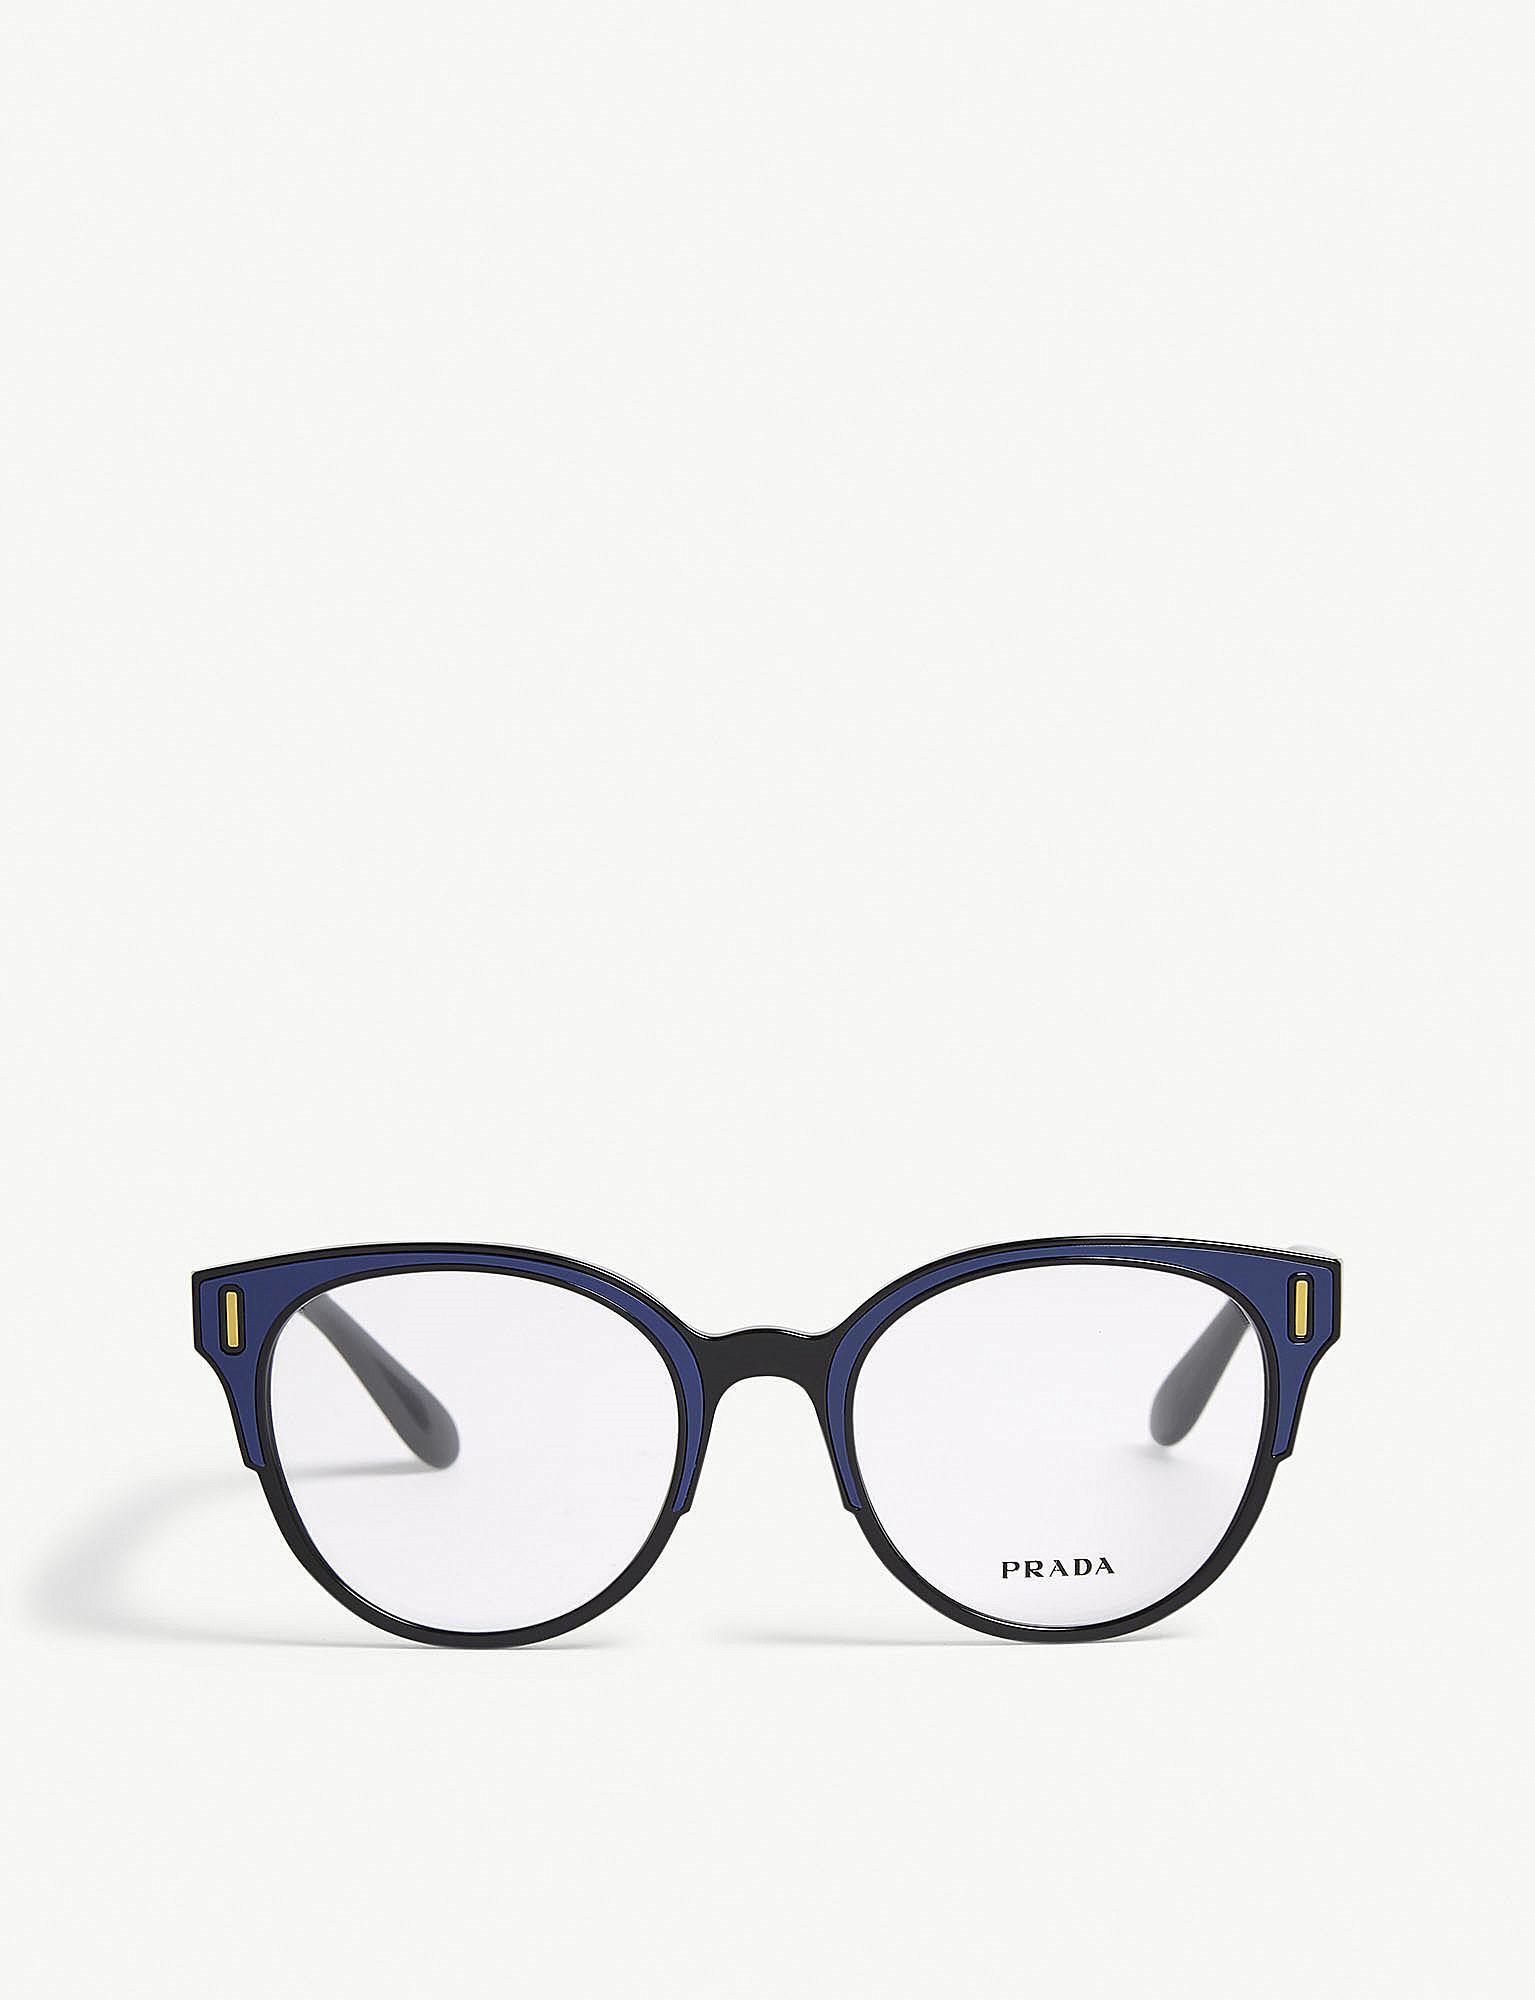 980f520c82e Prada - Womens Blue Pr08uv Round-frame Glasses - Lyst. View fullscreen